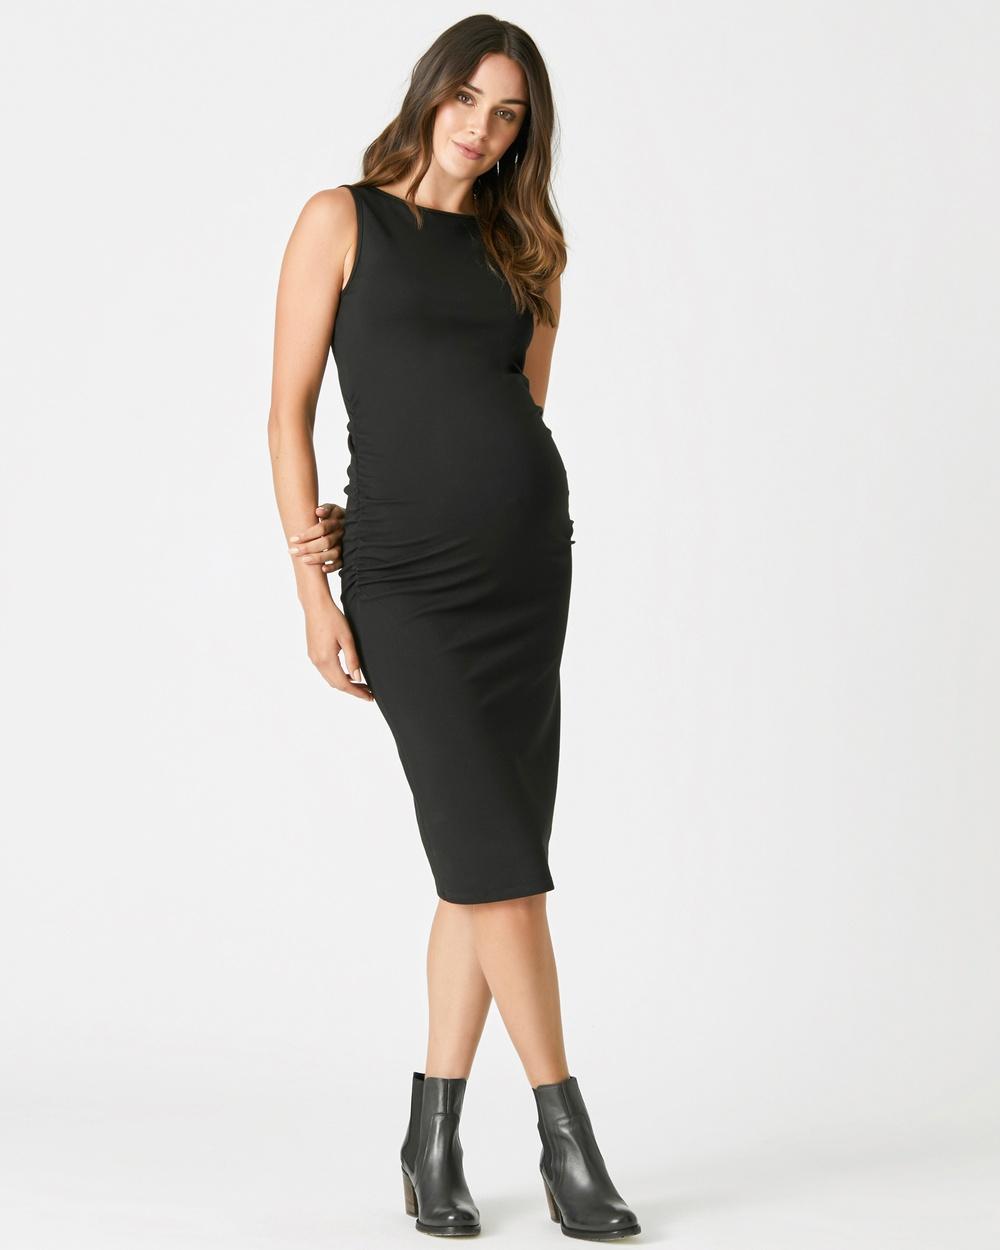 Pea in a Pod Maternity Blair Dress Bodycon Dresses Black Blair Dress